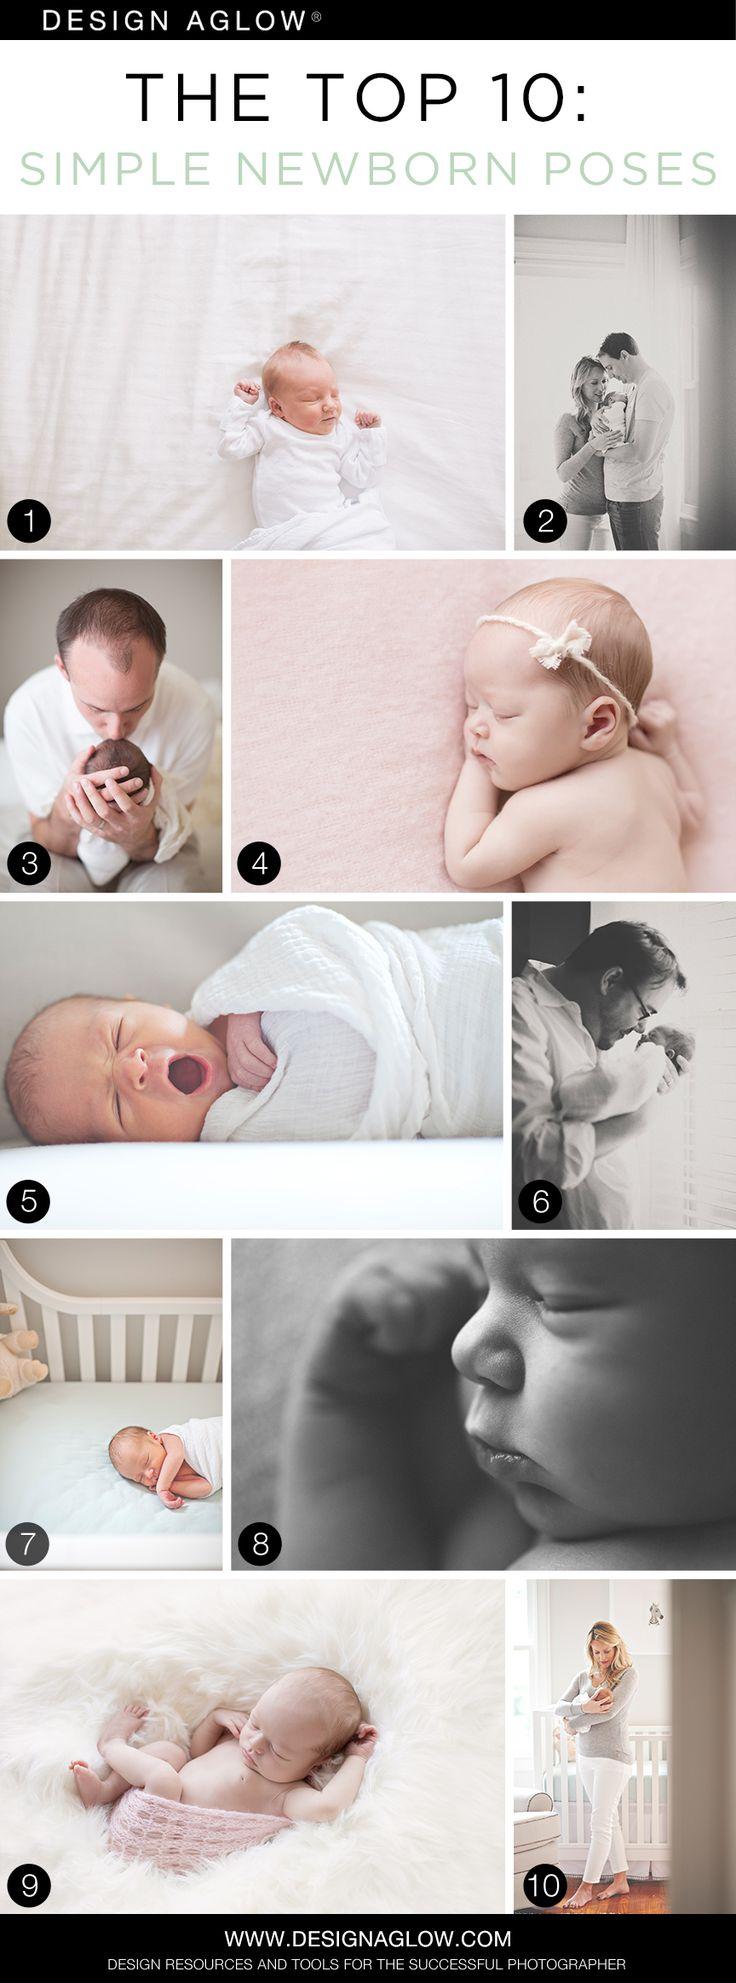 The Top 10: Simple Newborn Poses